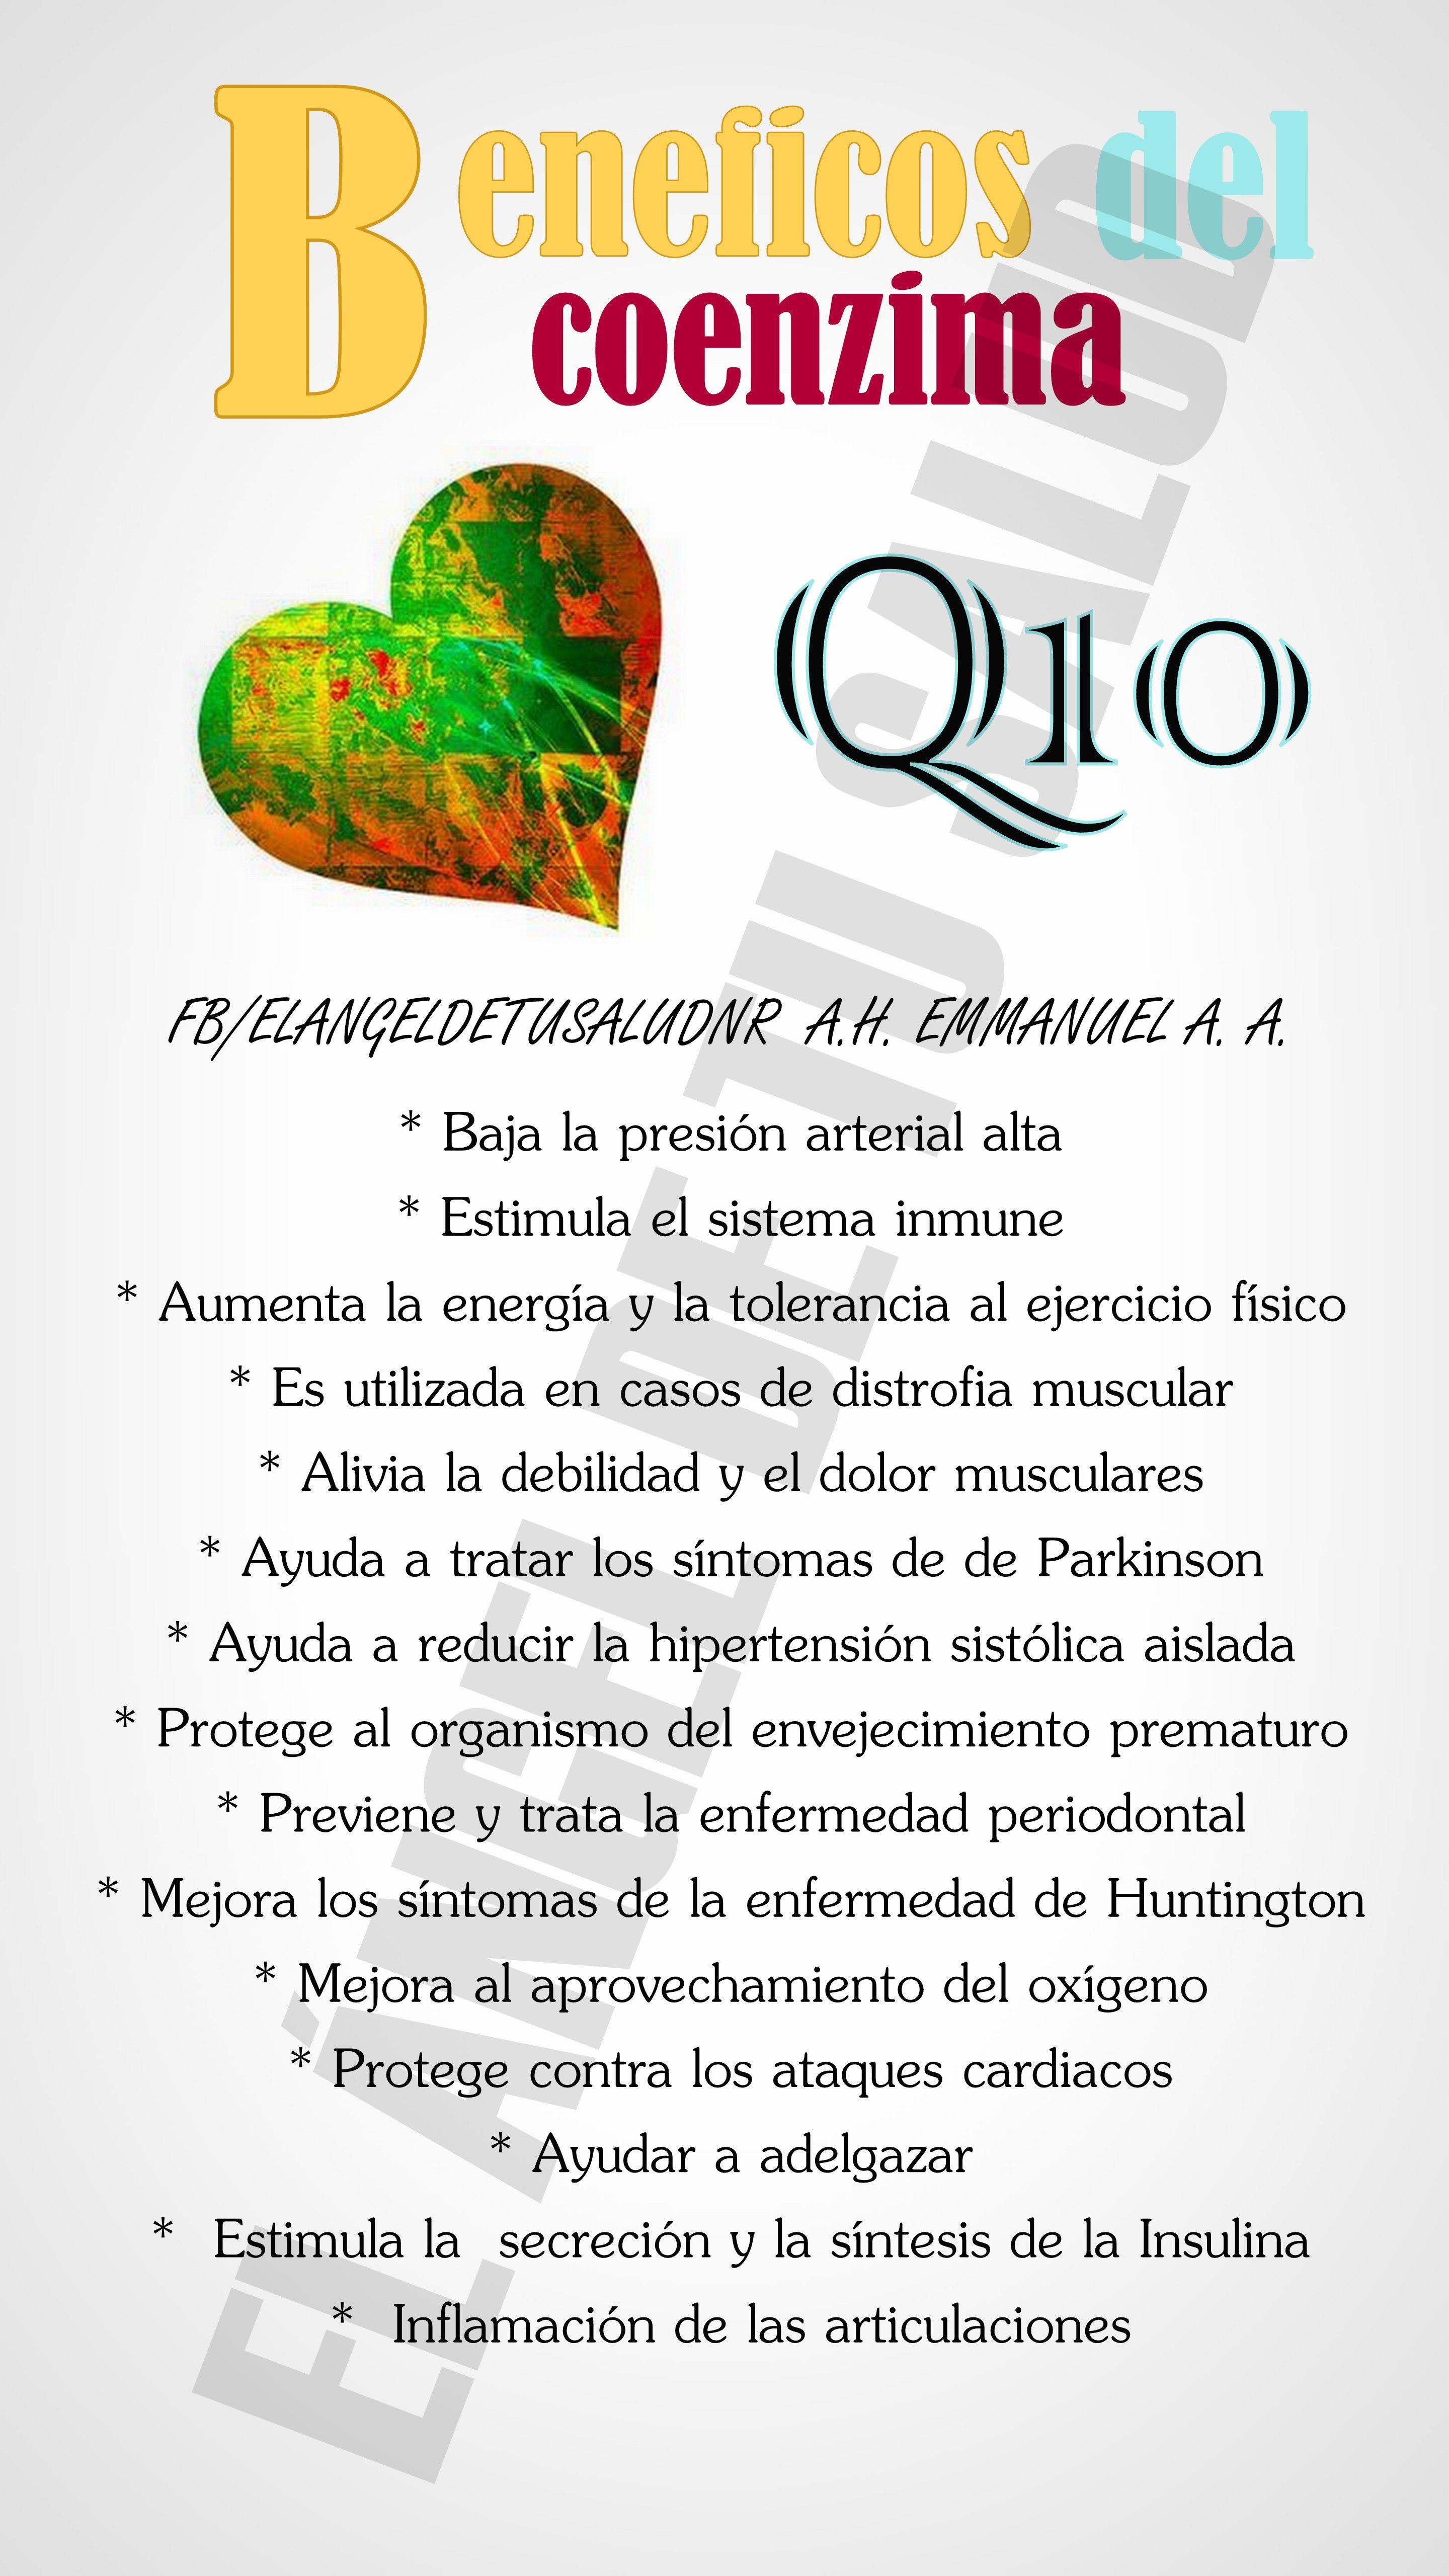 La coenzima q10 sirve para adelgazar